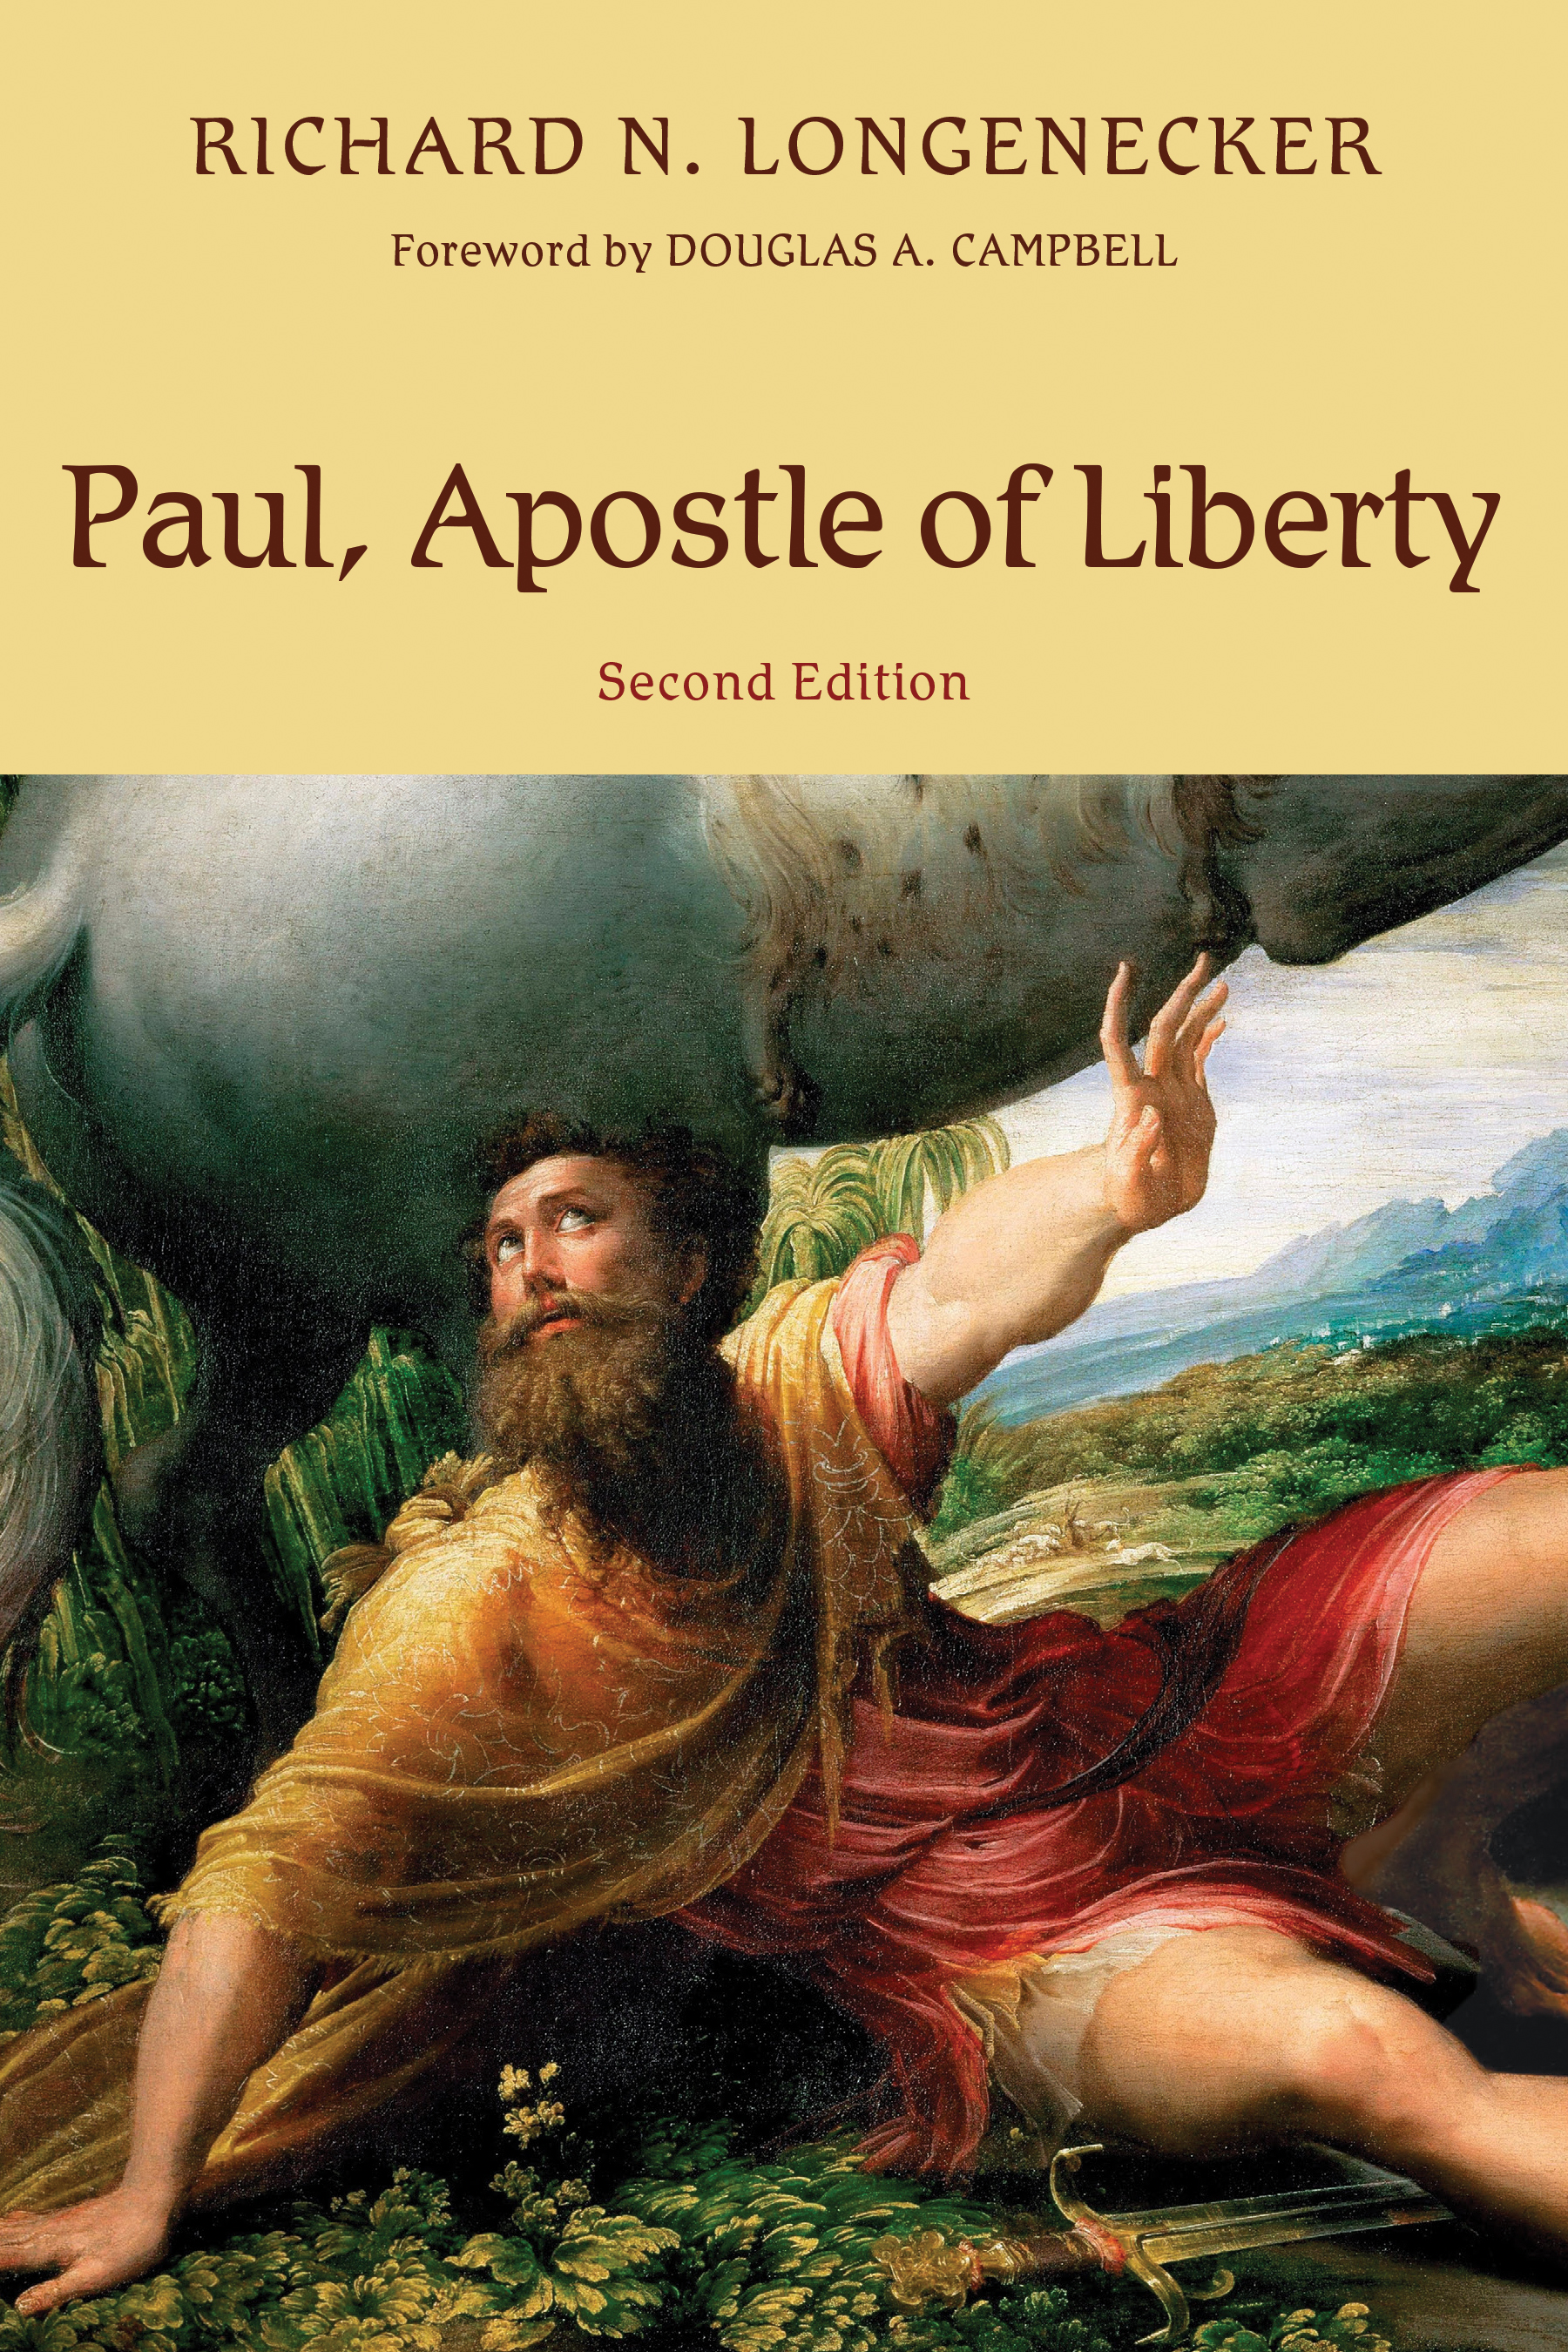 book review  richard n  longenecker  paul  apostle of